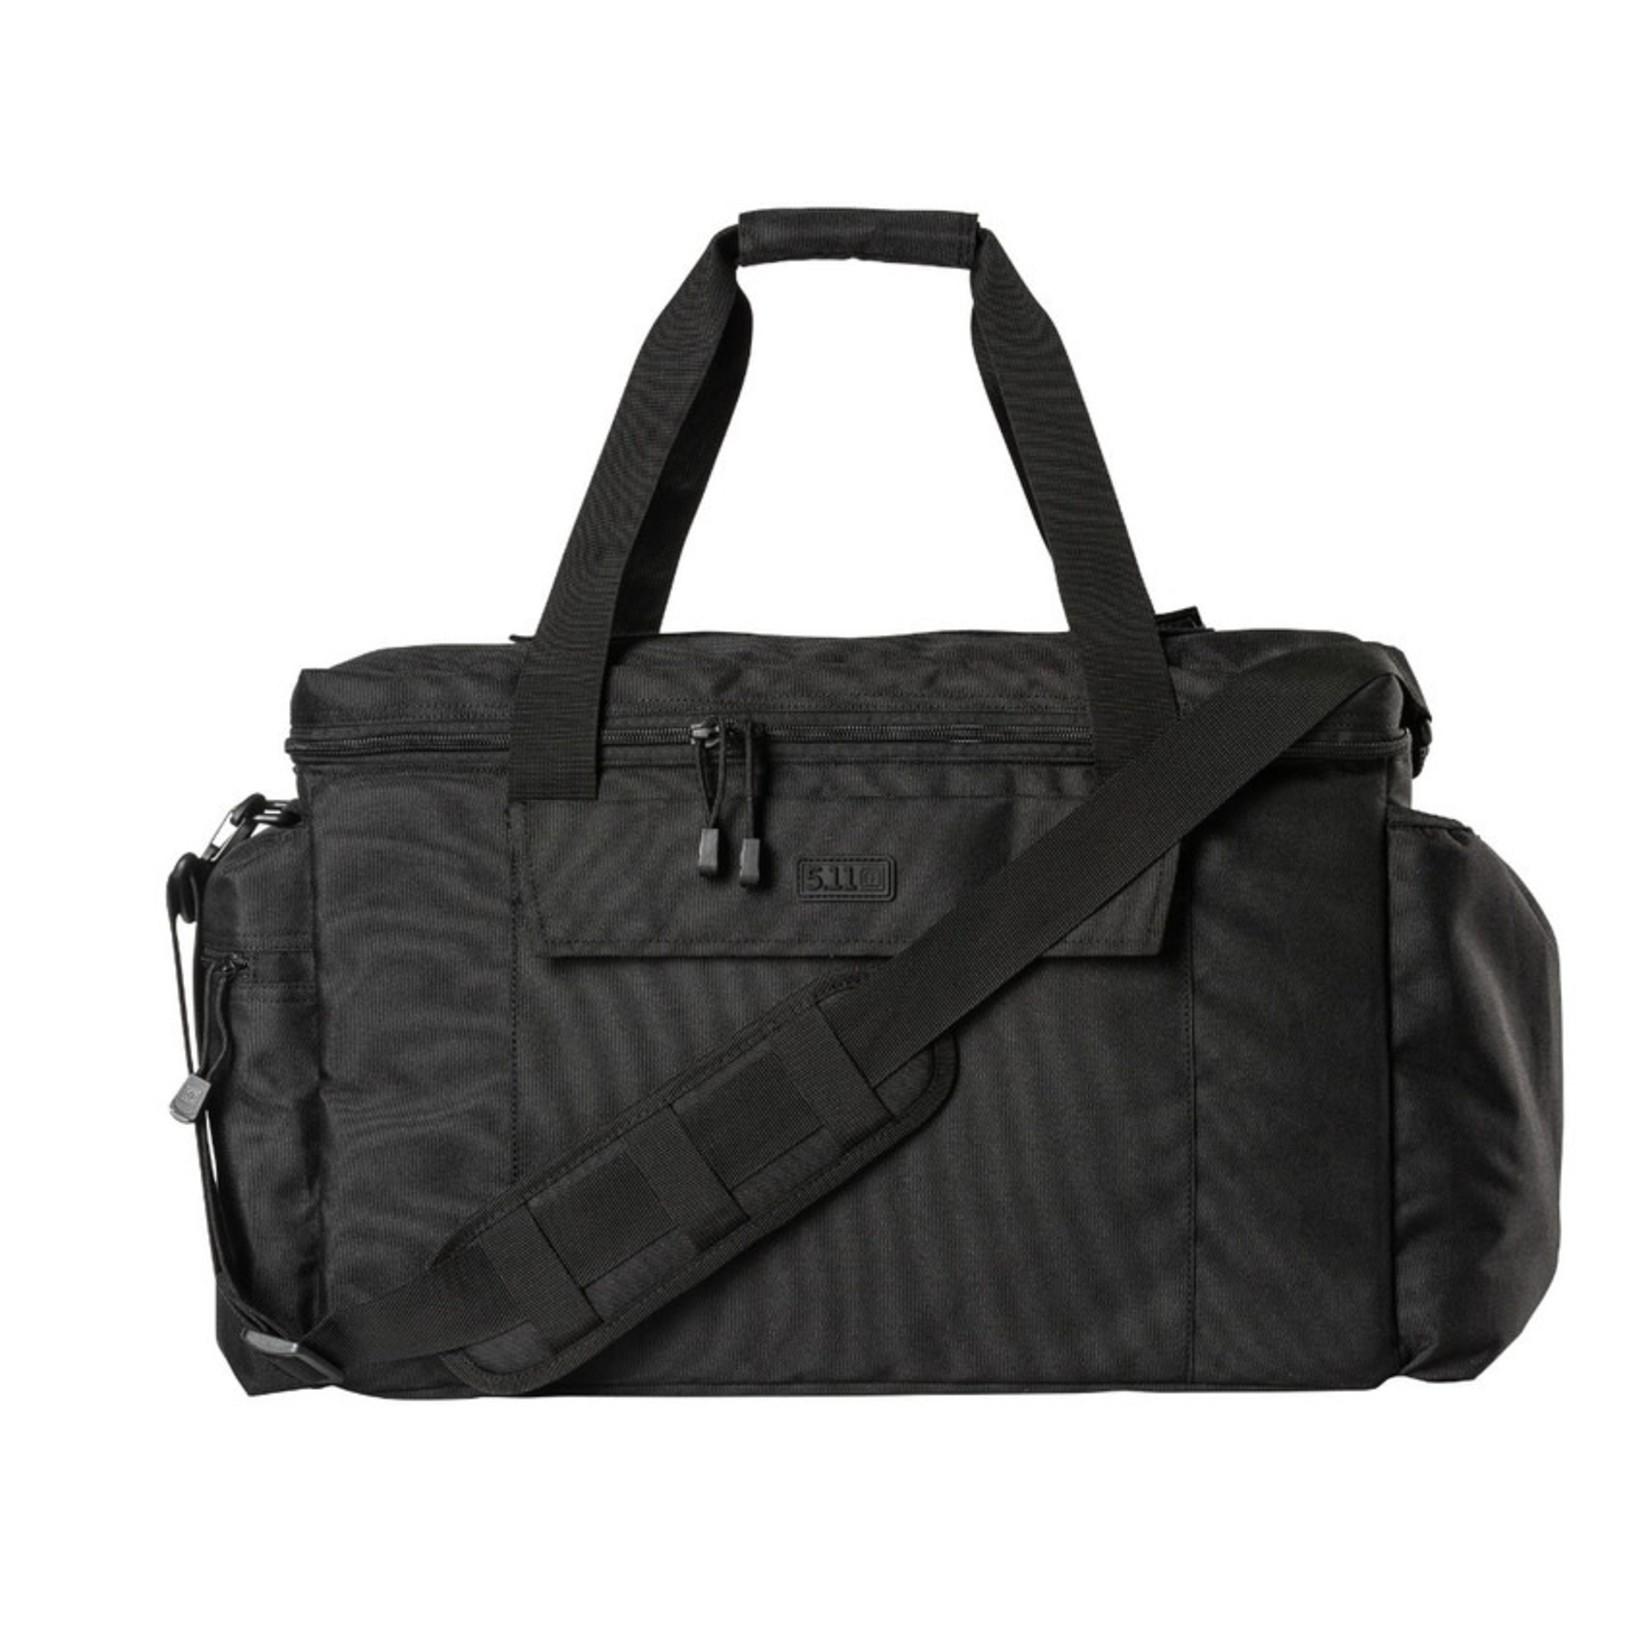 5.11 Tactical 5.11 Basic Patrol Bag